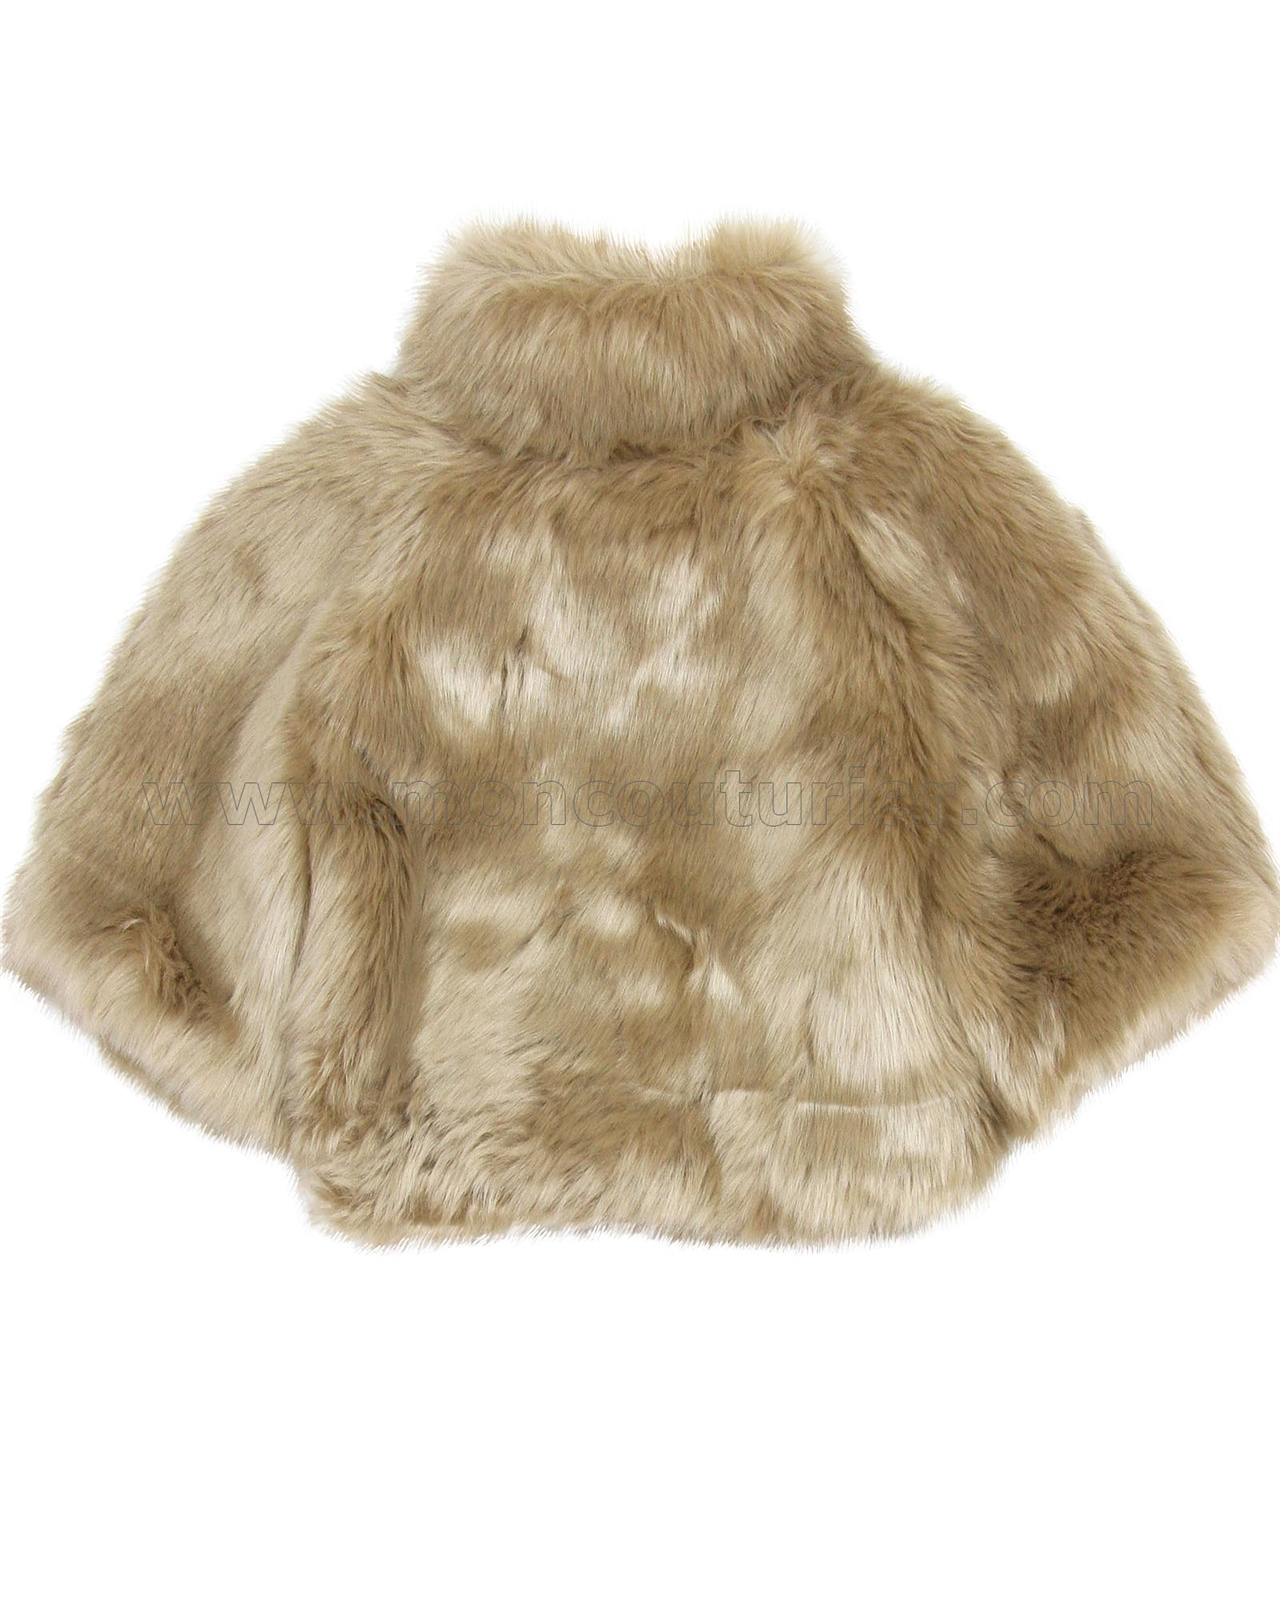 Kate Mack Biscotti Girls Grand Entrance Faux Fur Jacket Sizes 4-16